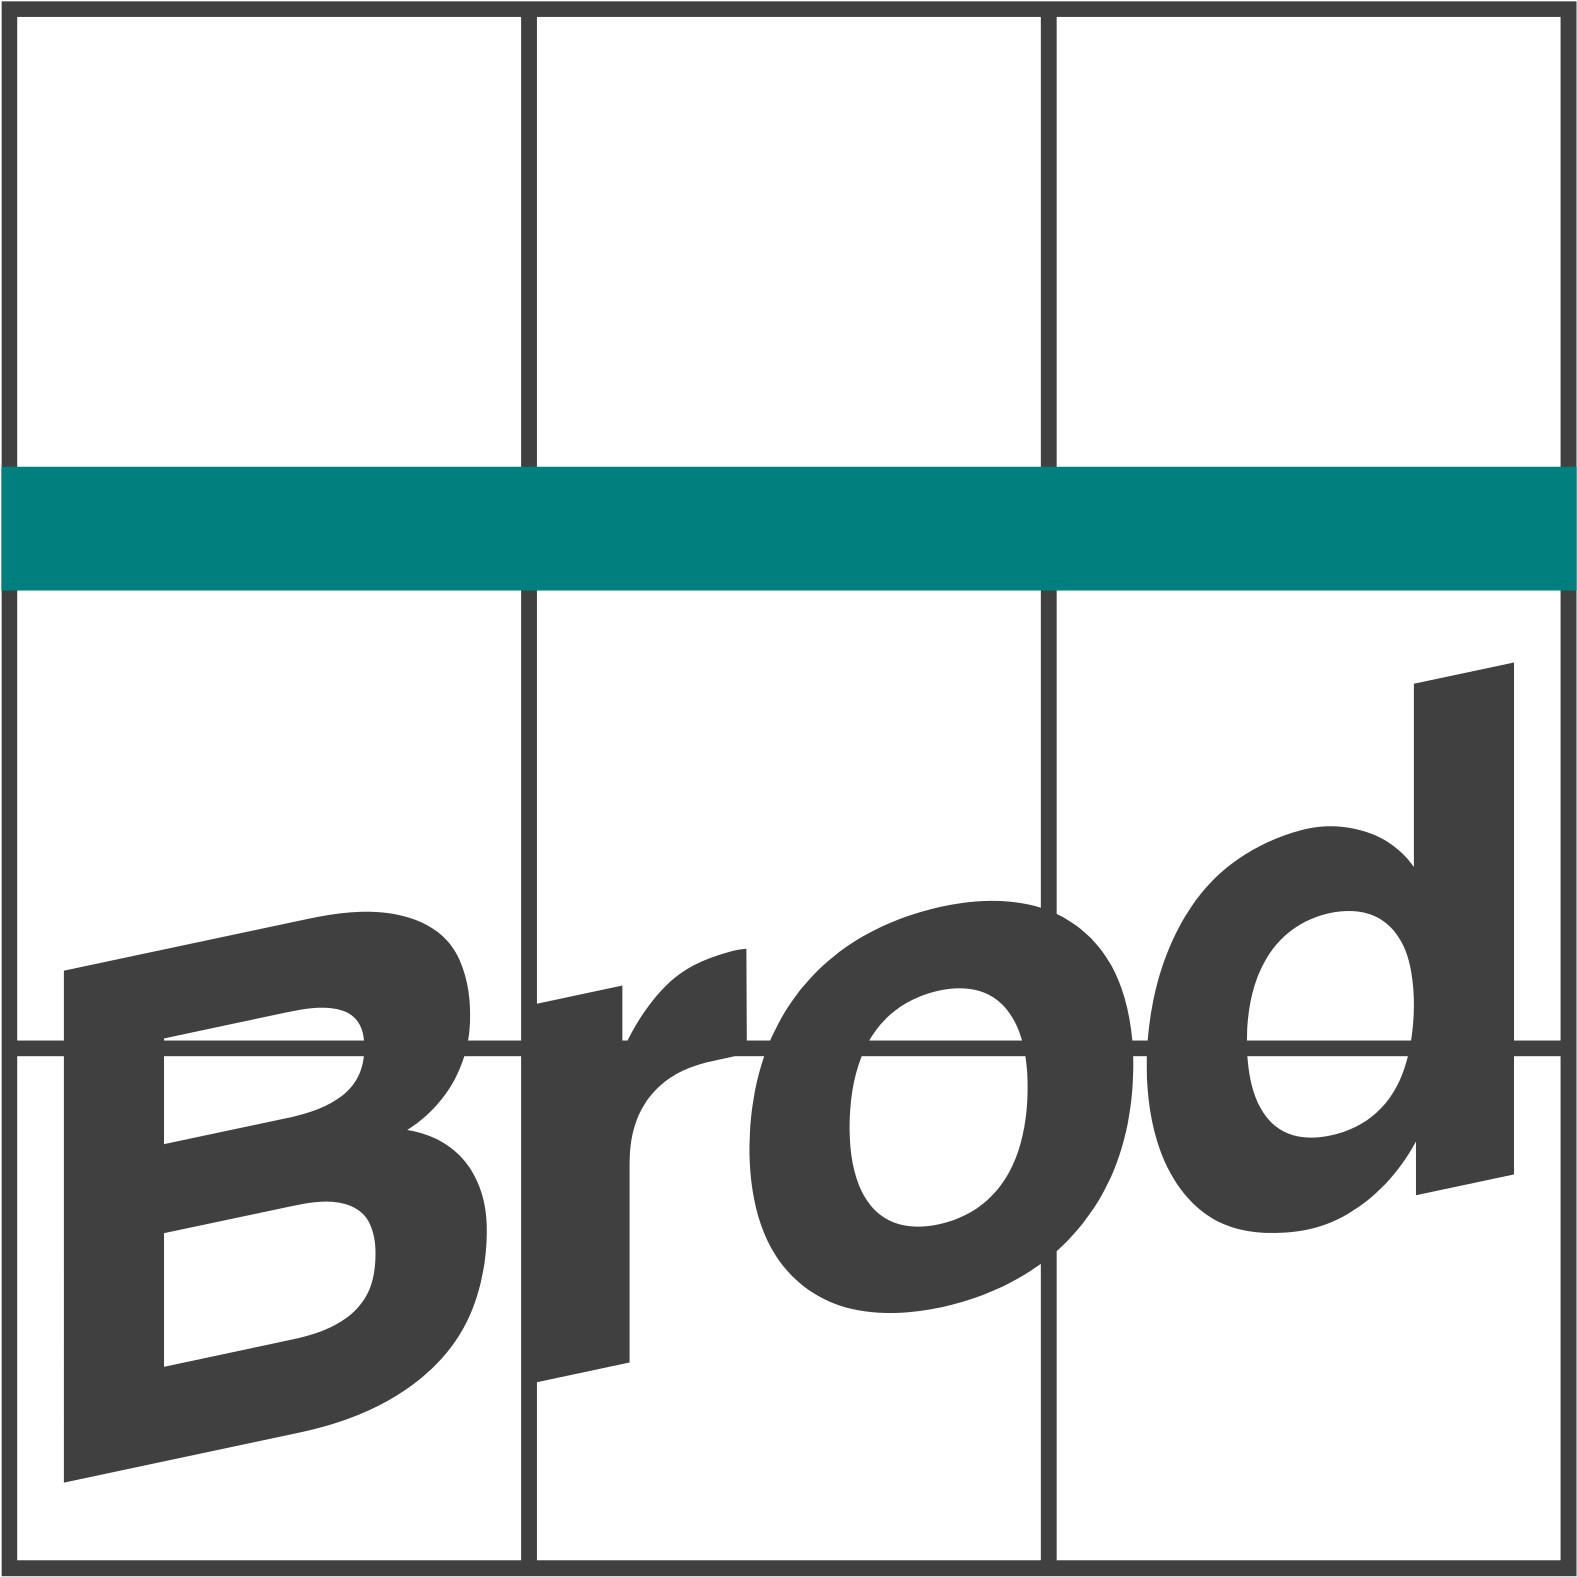 Brod GmbH & Co. KG